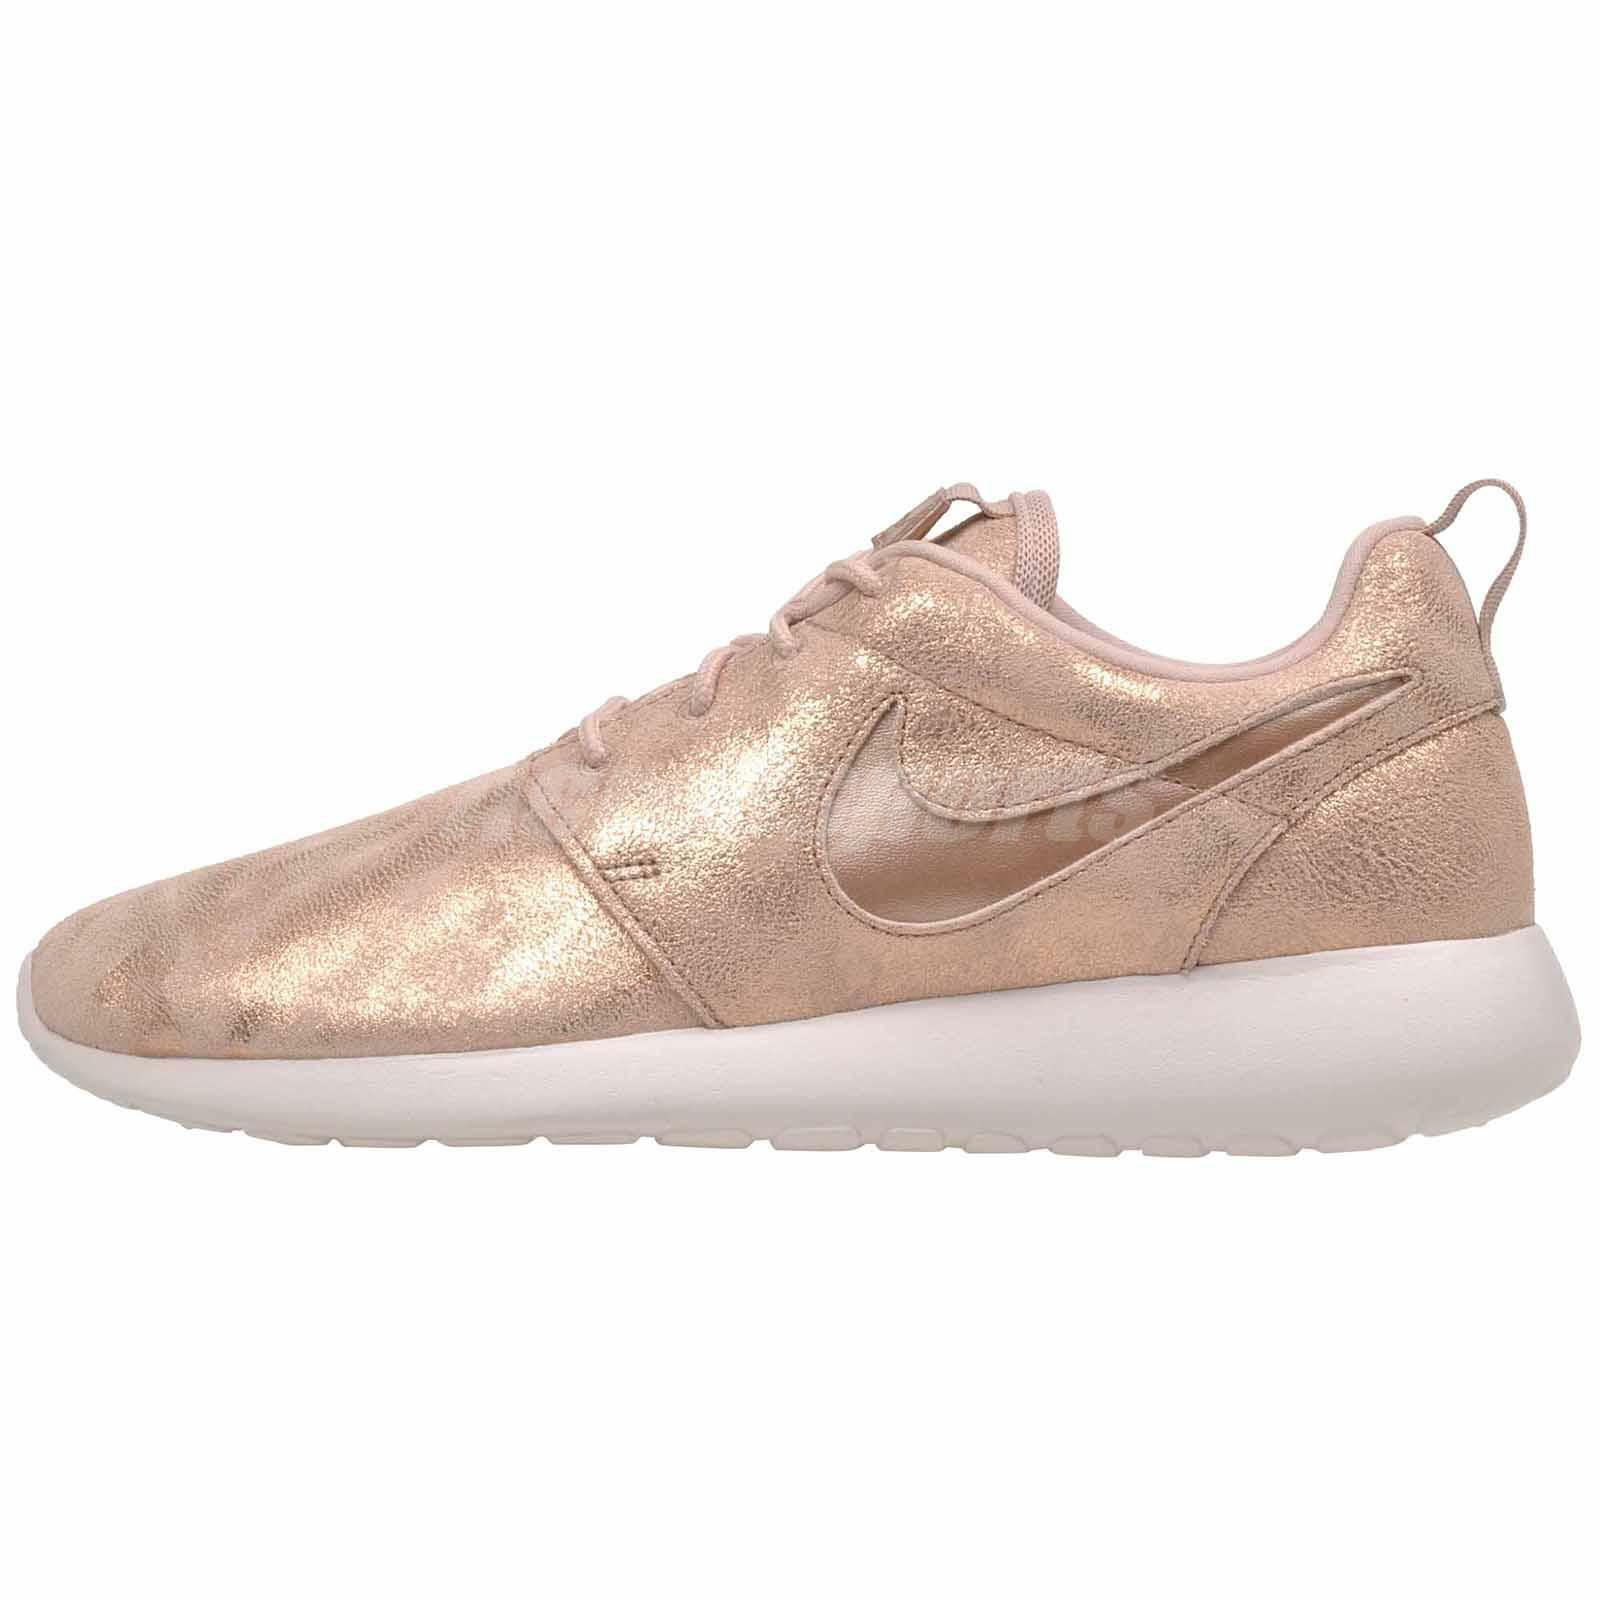 Nike Nike Nike wmns roshe una ridotta in bronzo 833928-900 scarpe femminili. | Benvenuto  | Uomini/Donne Scarpa  271a1d